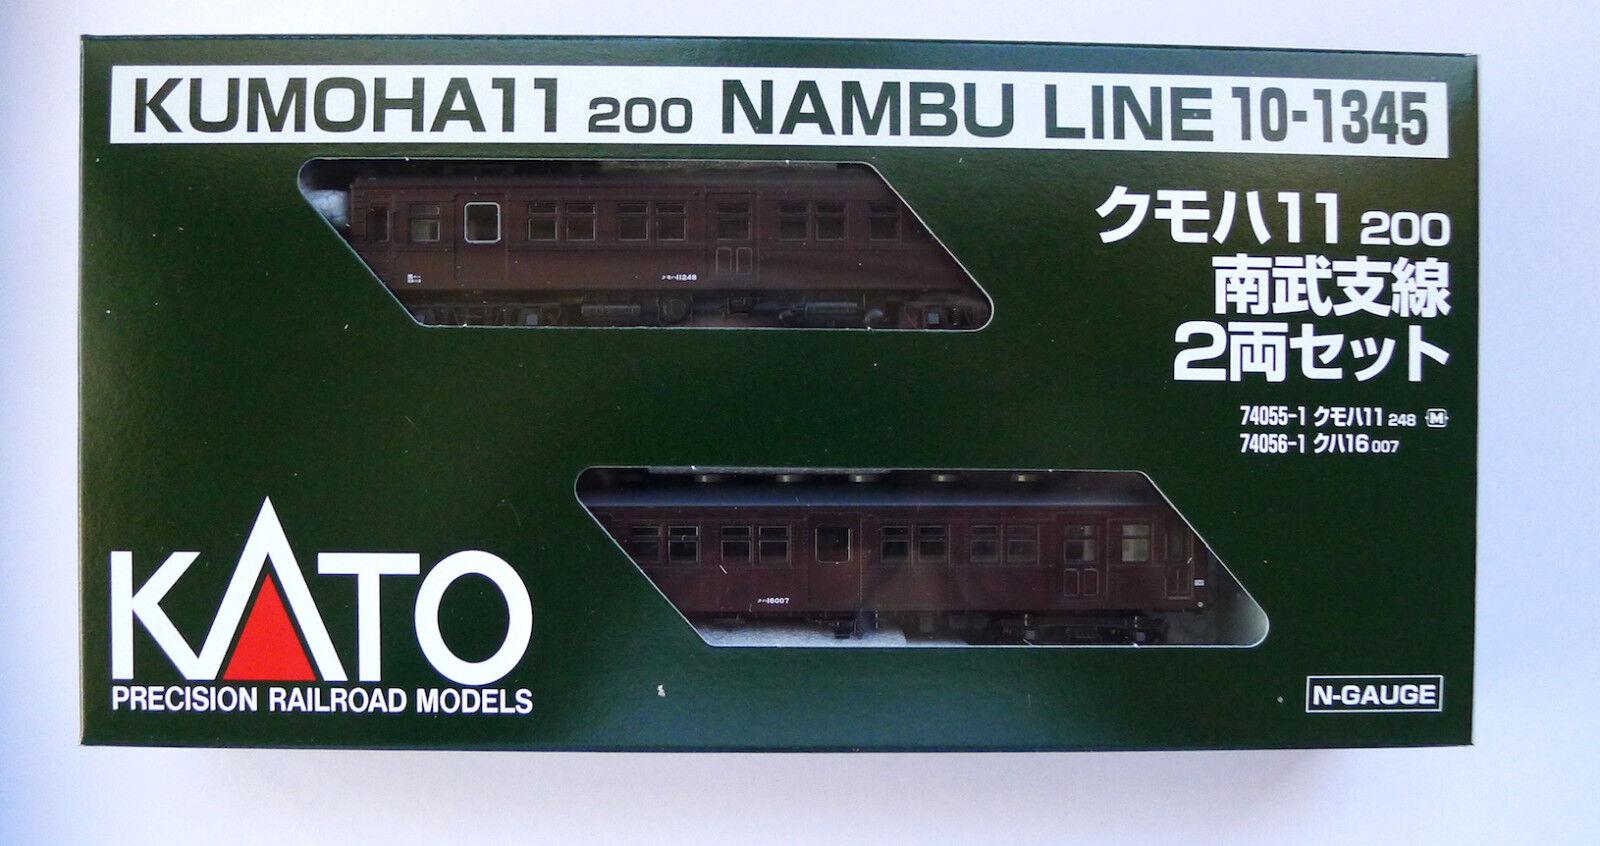 Kato N skala 10 -1345 KUMOHA 11 200 Nambu Line 2 bils